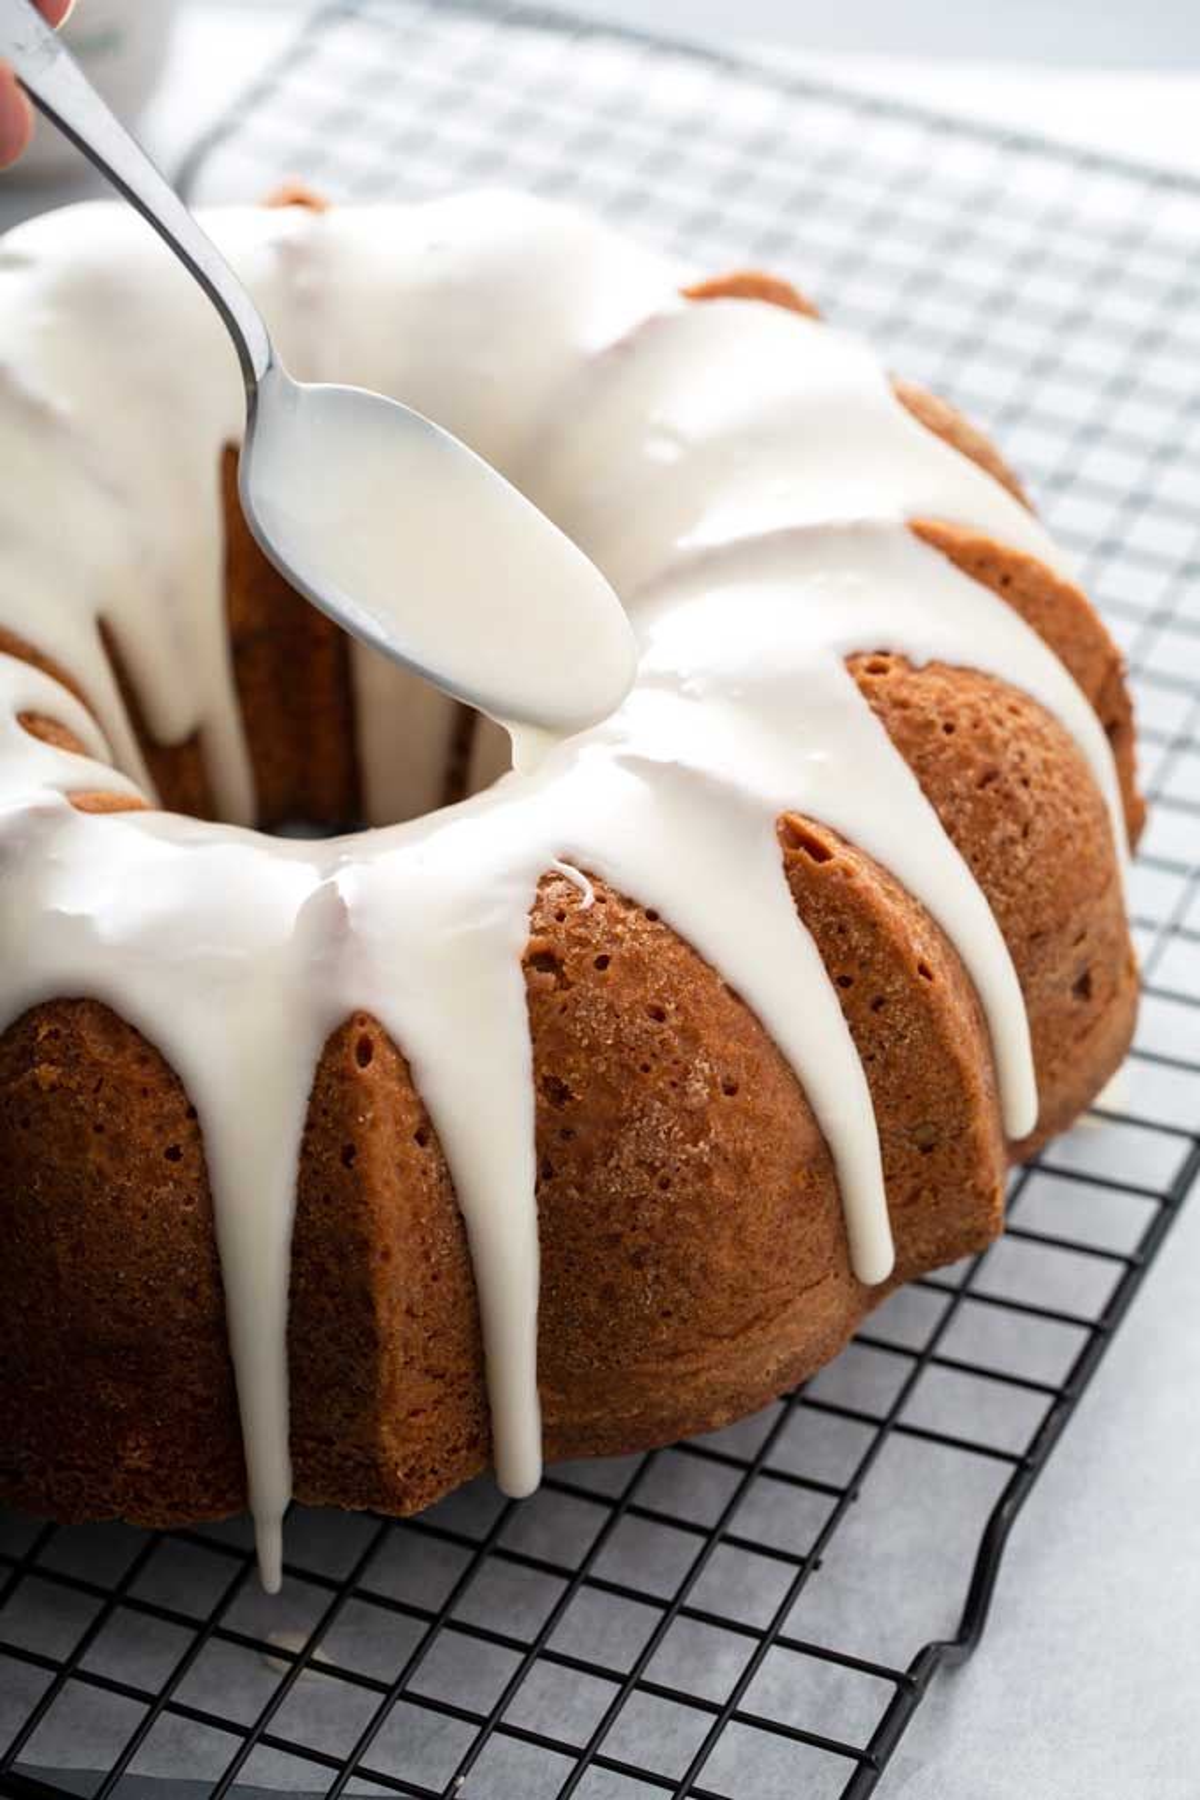 A spoon pouring vanilla glaze over bundt cake